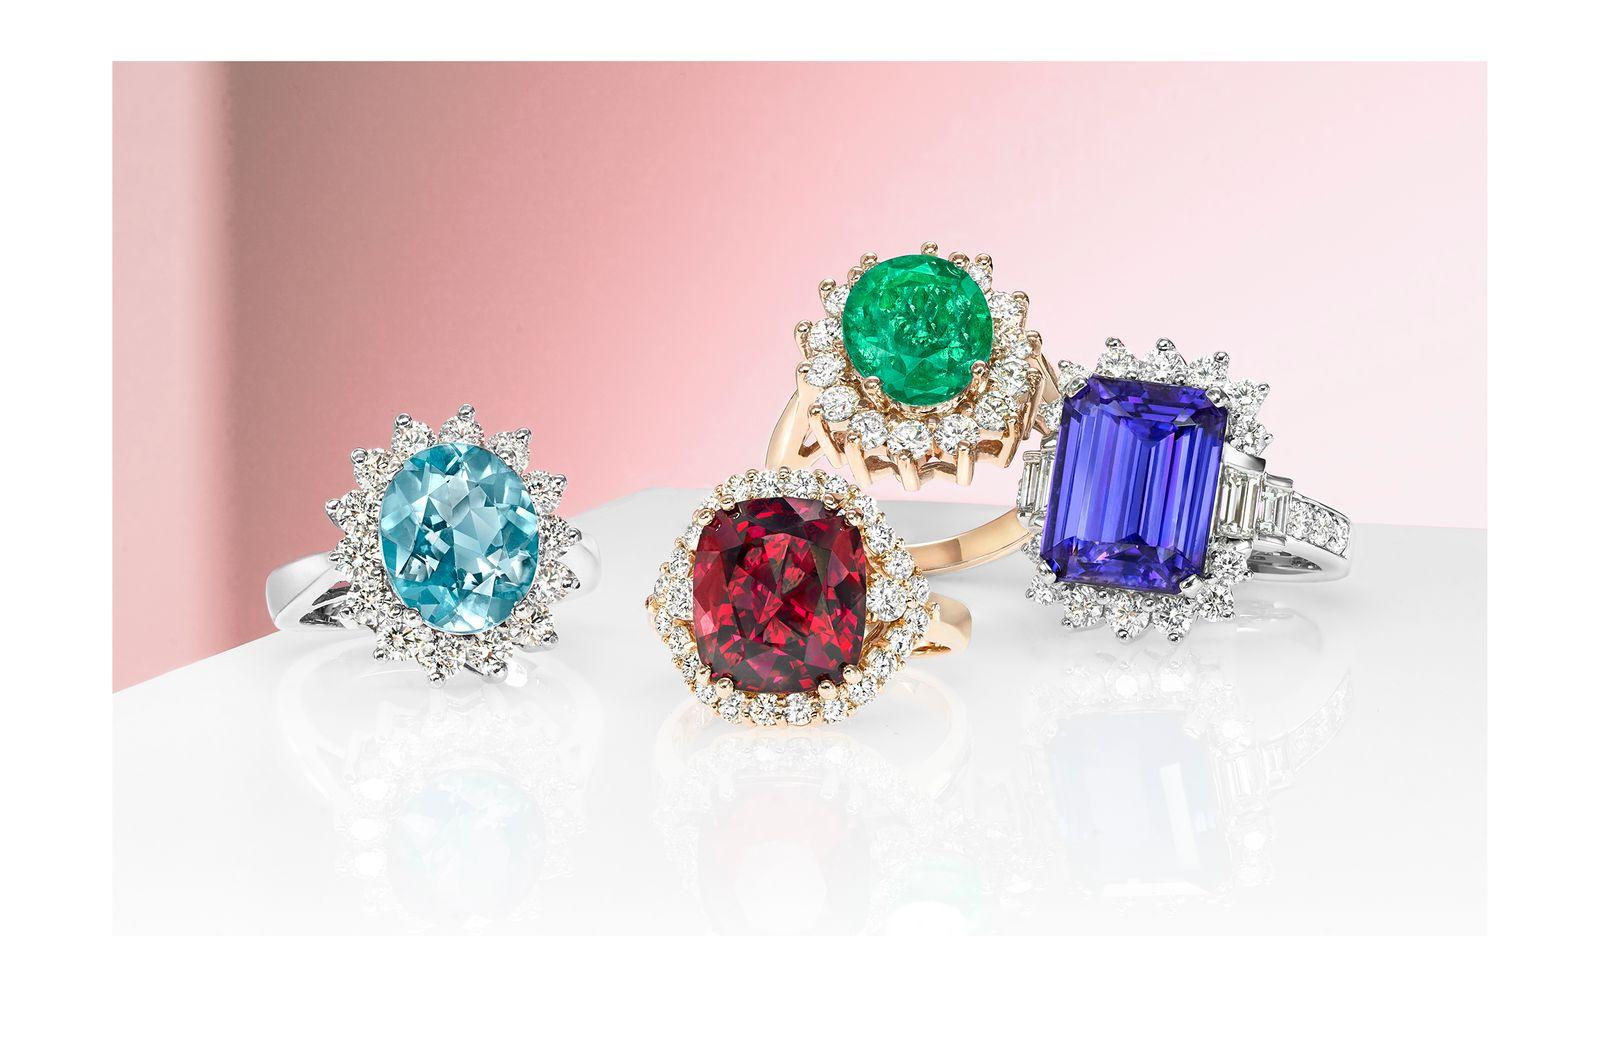 Precious Jewelry Photography 34.jpg